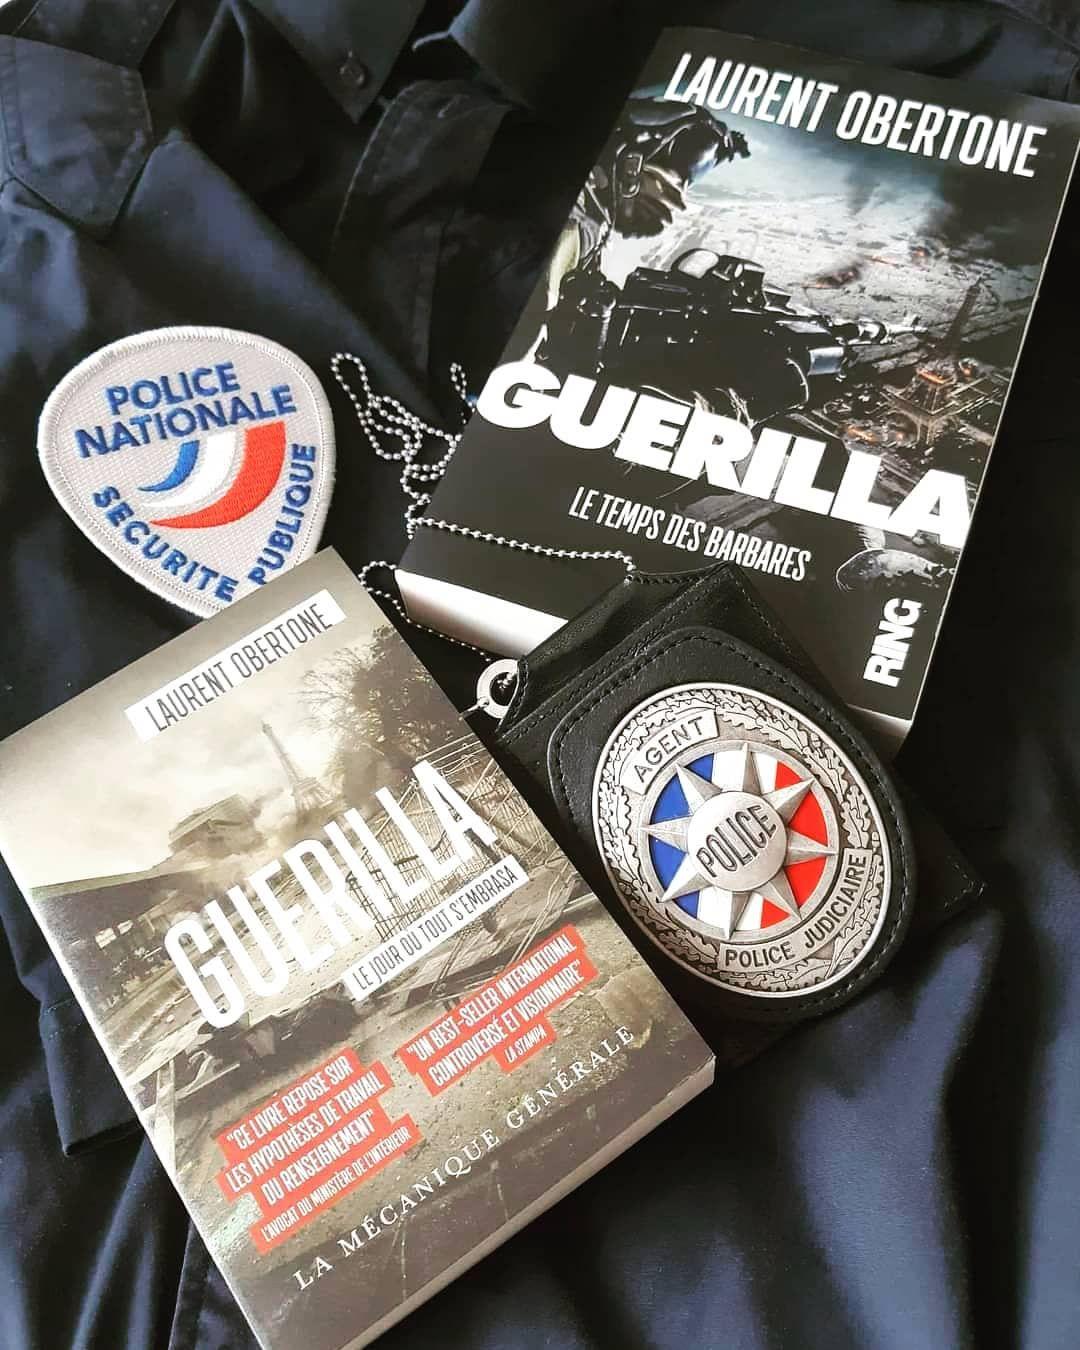 La Guerilla Est En Marche Guerilla Obertone Ring Guerre Francais War Soolking Jewelry Bigbrother In 2020 Book Cover Convenience Store Products Books